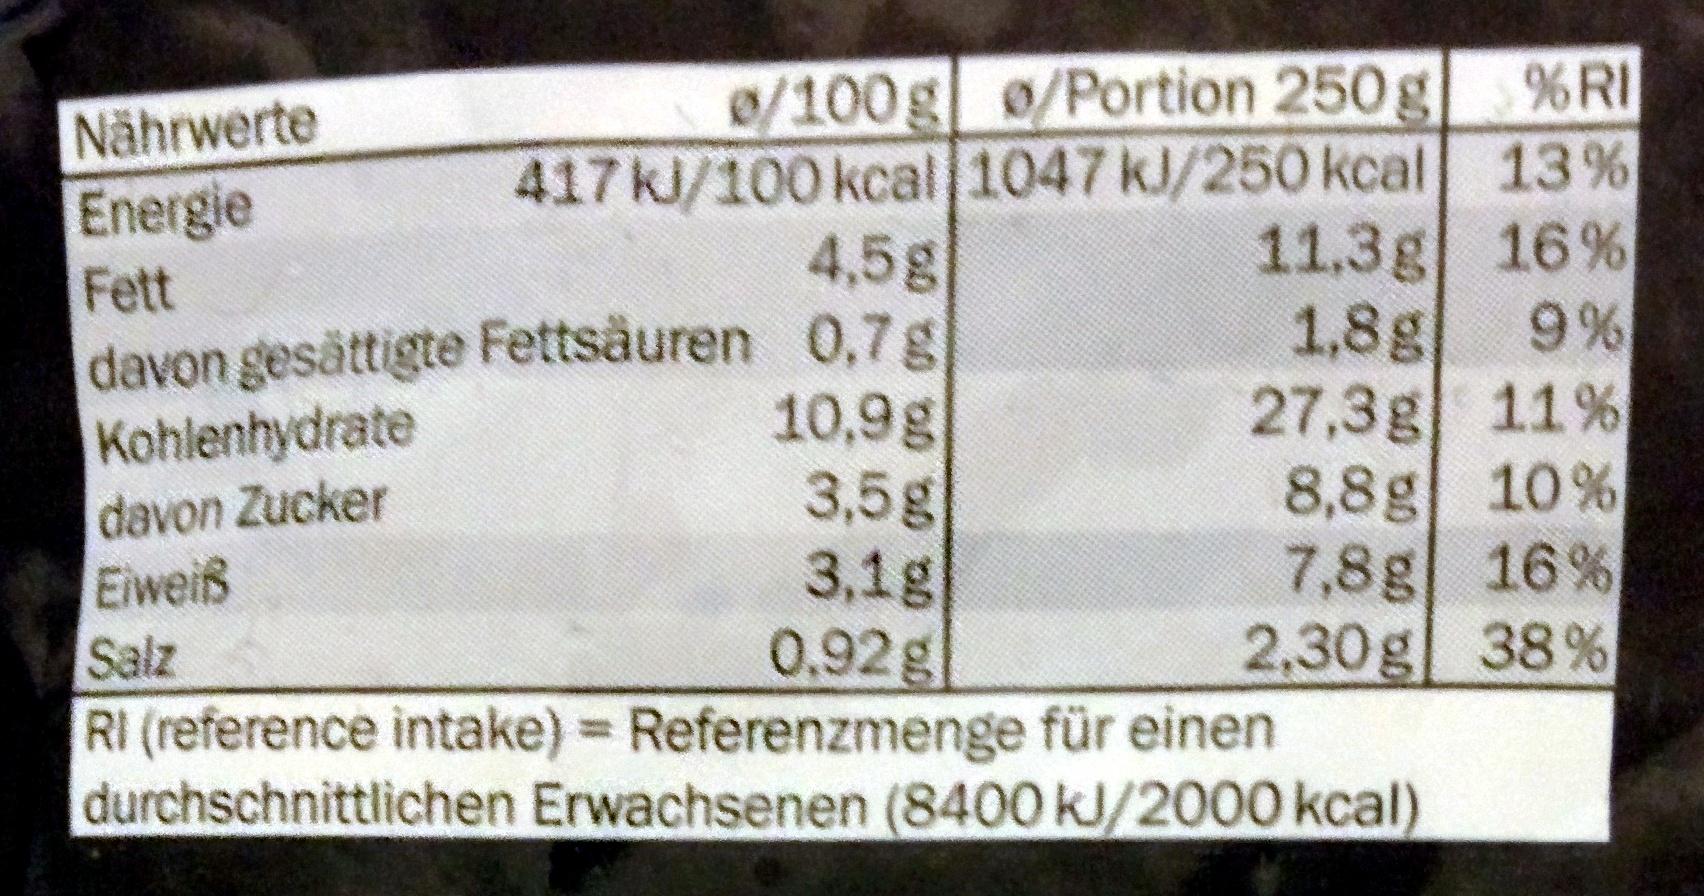 Conchiglie vin verdure e pesto rosso - Voedingswaarden - de